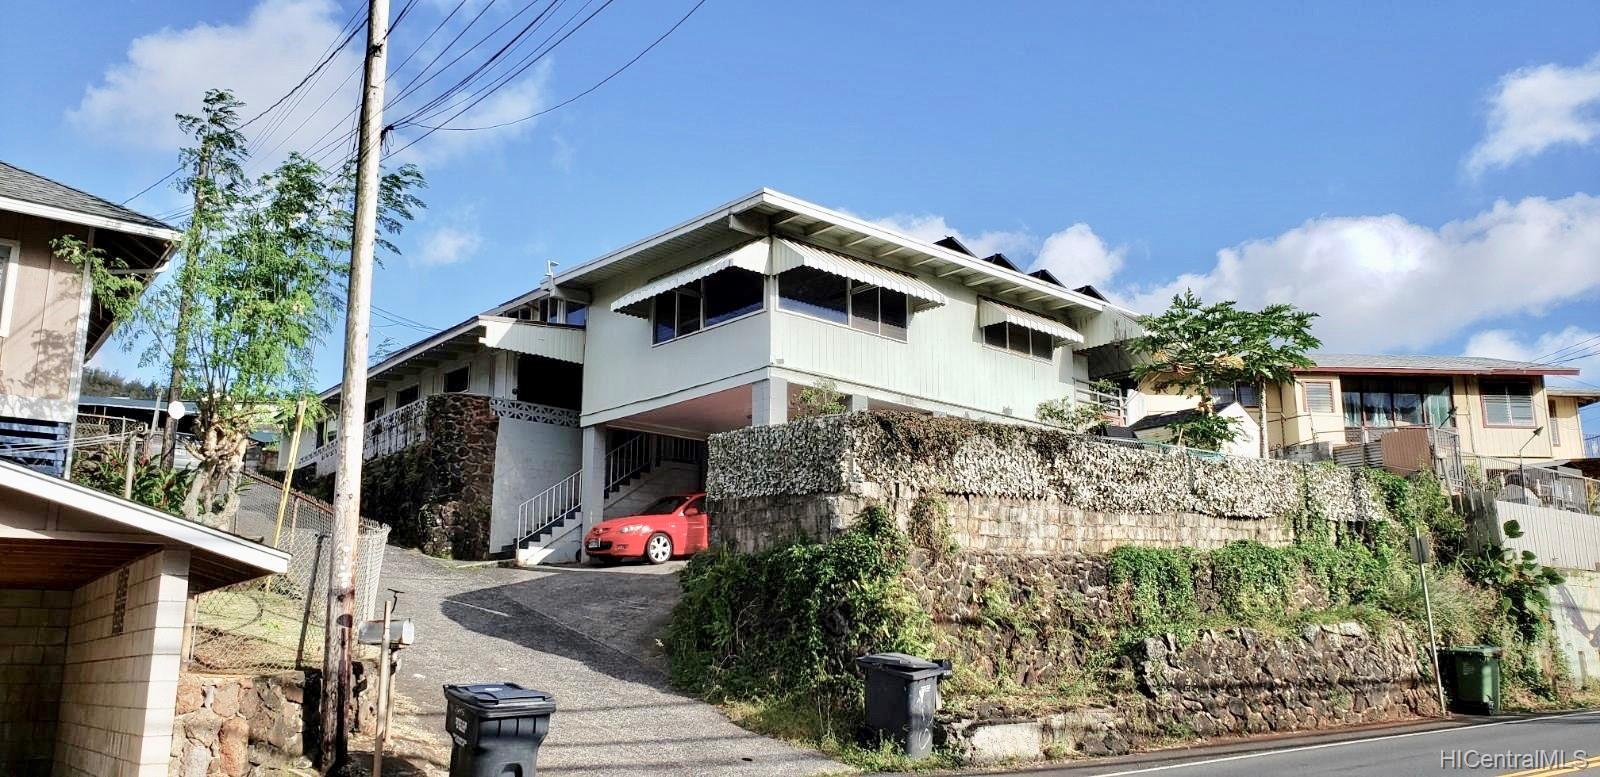 2609 Kalihi Street Honolulu Hi 96819   Kalihi Valley home Honolulu 1600x1200